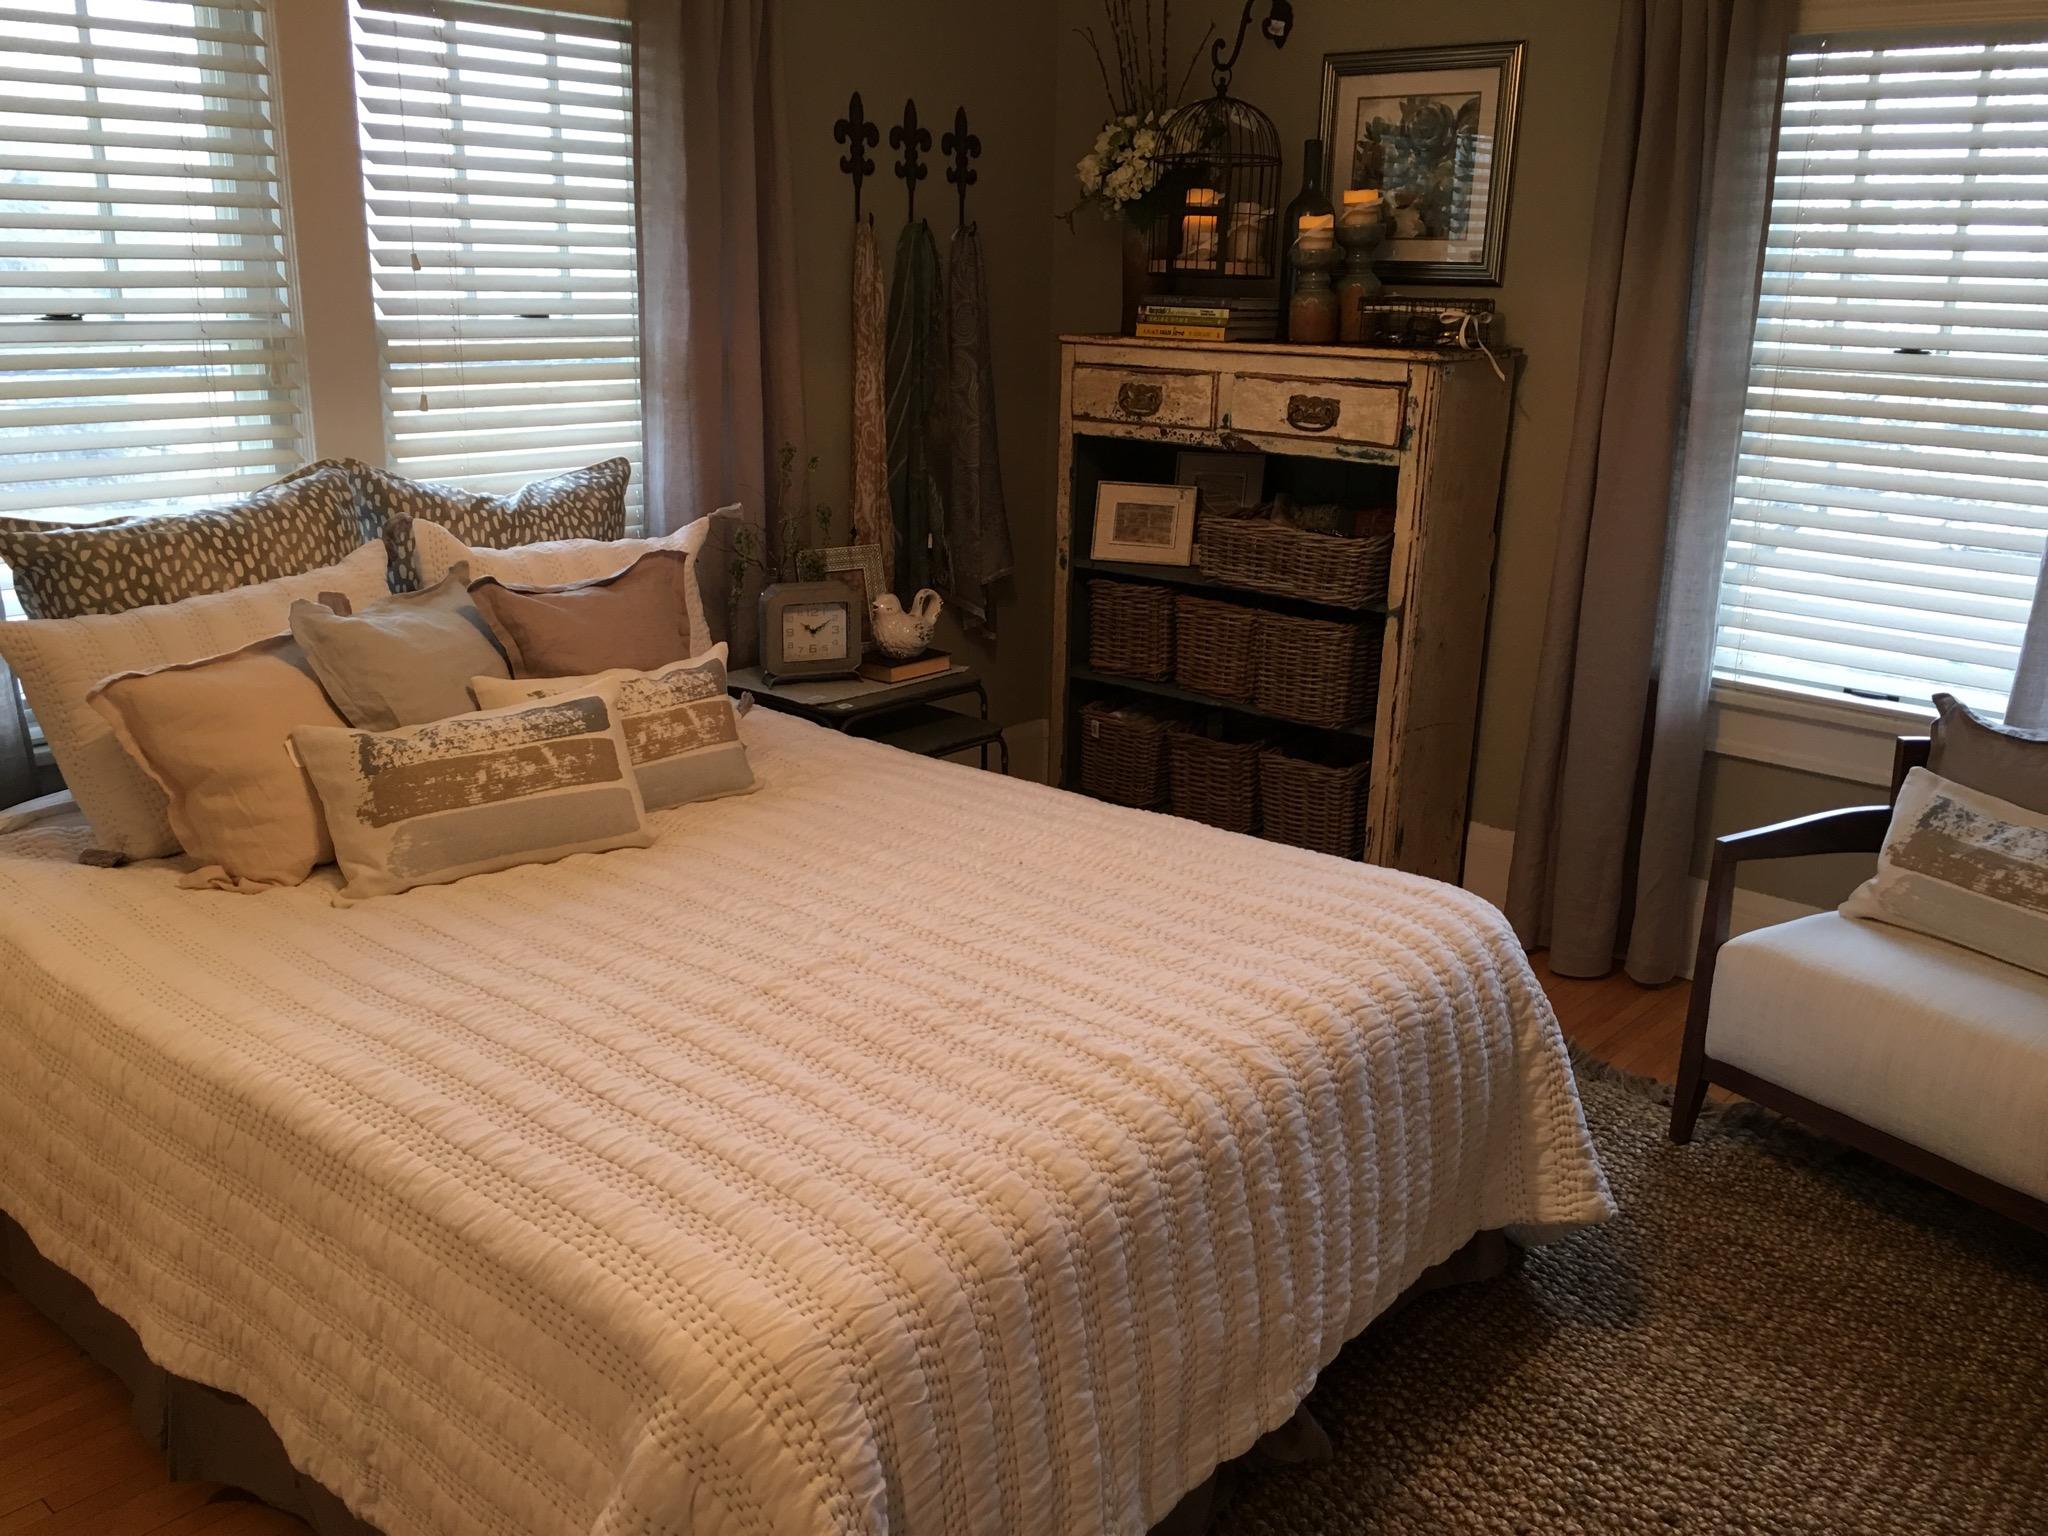 Spa Bedroom Master Bedroom Spa Retreat At Bachmans Spring Idea House 6ftmama